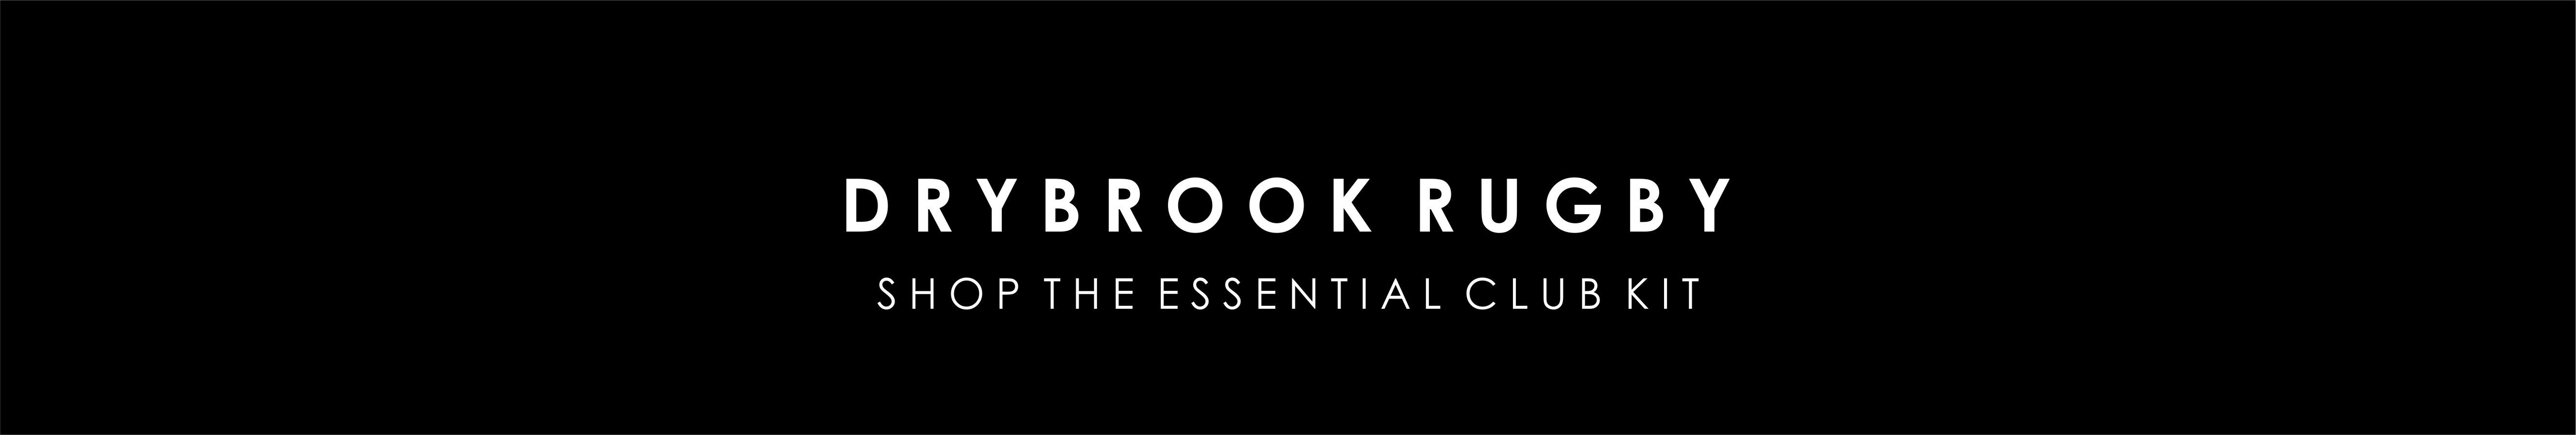 drybrook-rugby-banner.jpg